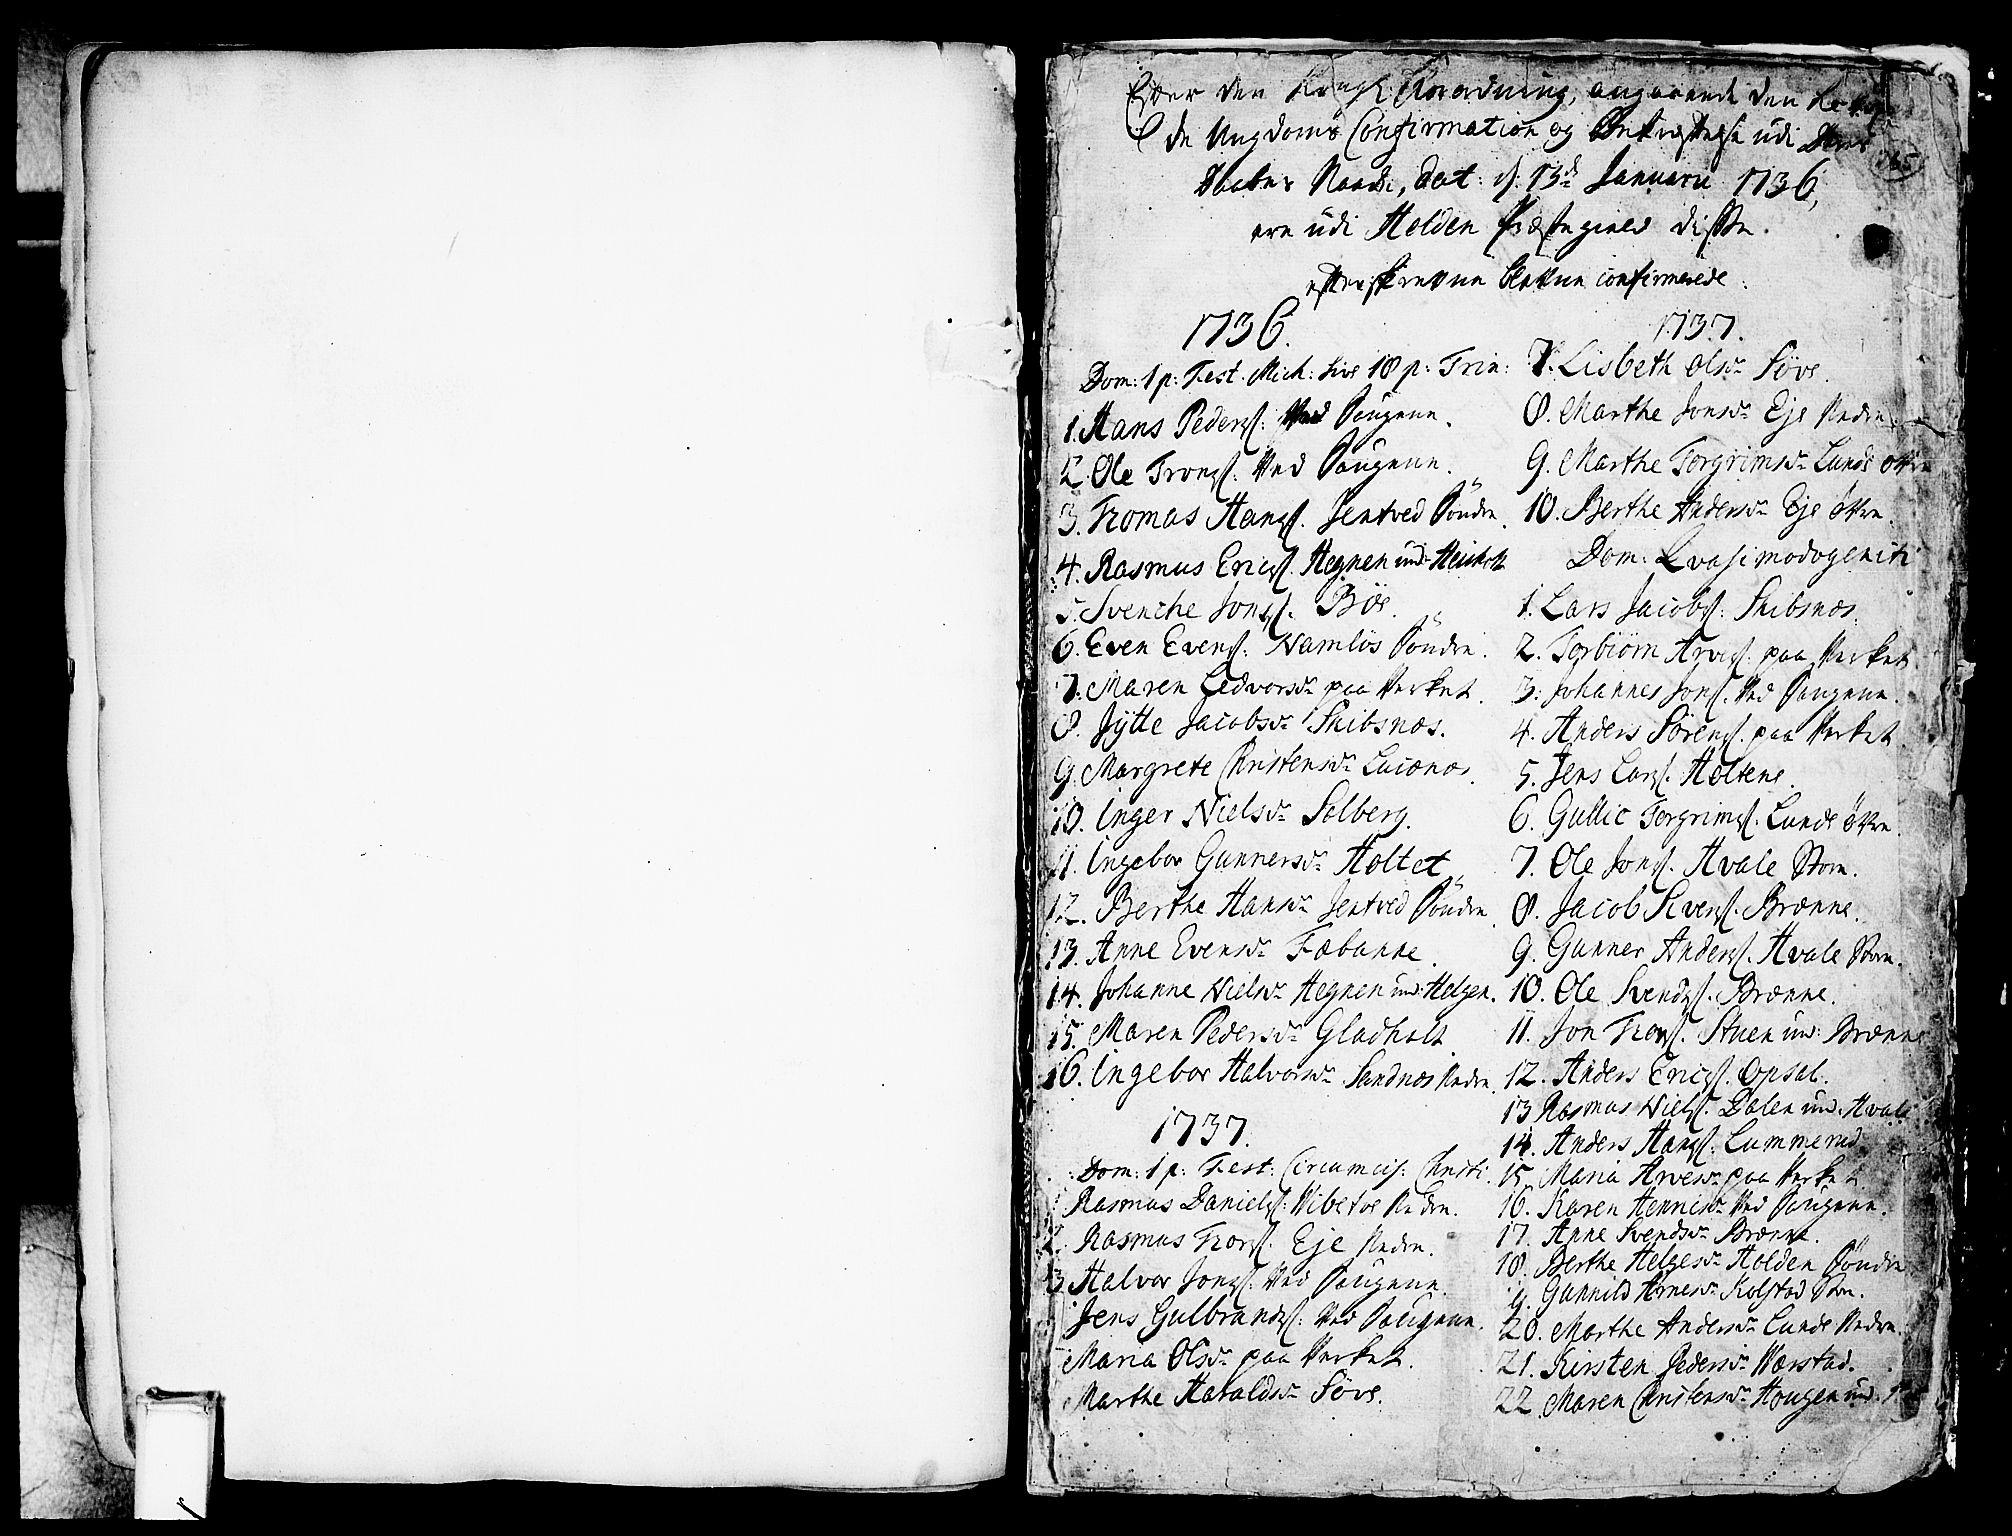 SAKO, Holla kirkebøker, F/Fa/L0001: Ministerialbok nr. 1, 1717-1779, s. 265